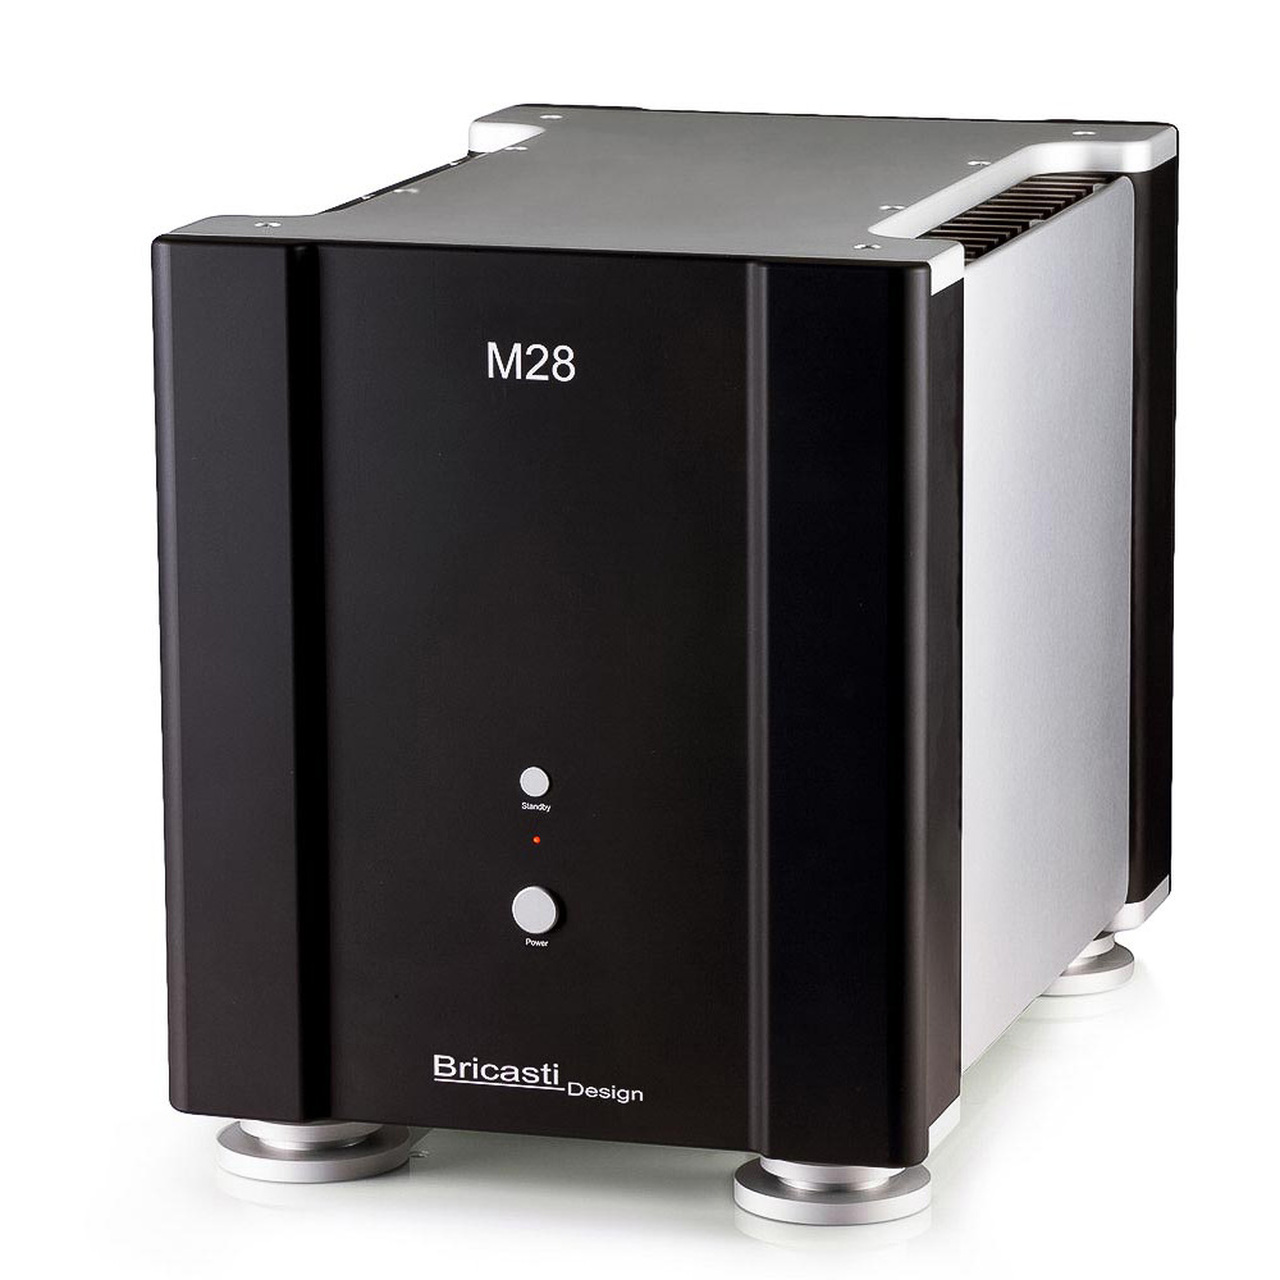 Bricasti M28 monoblock amplifiers